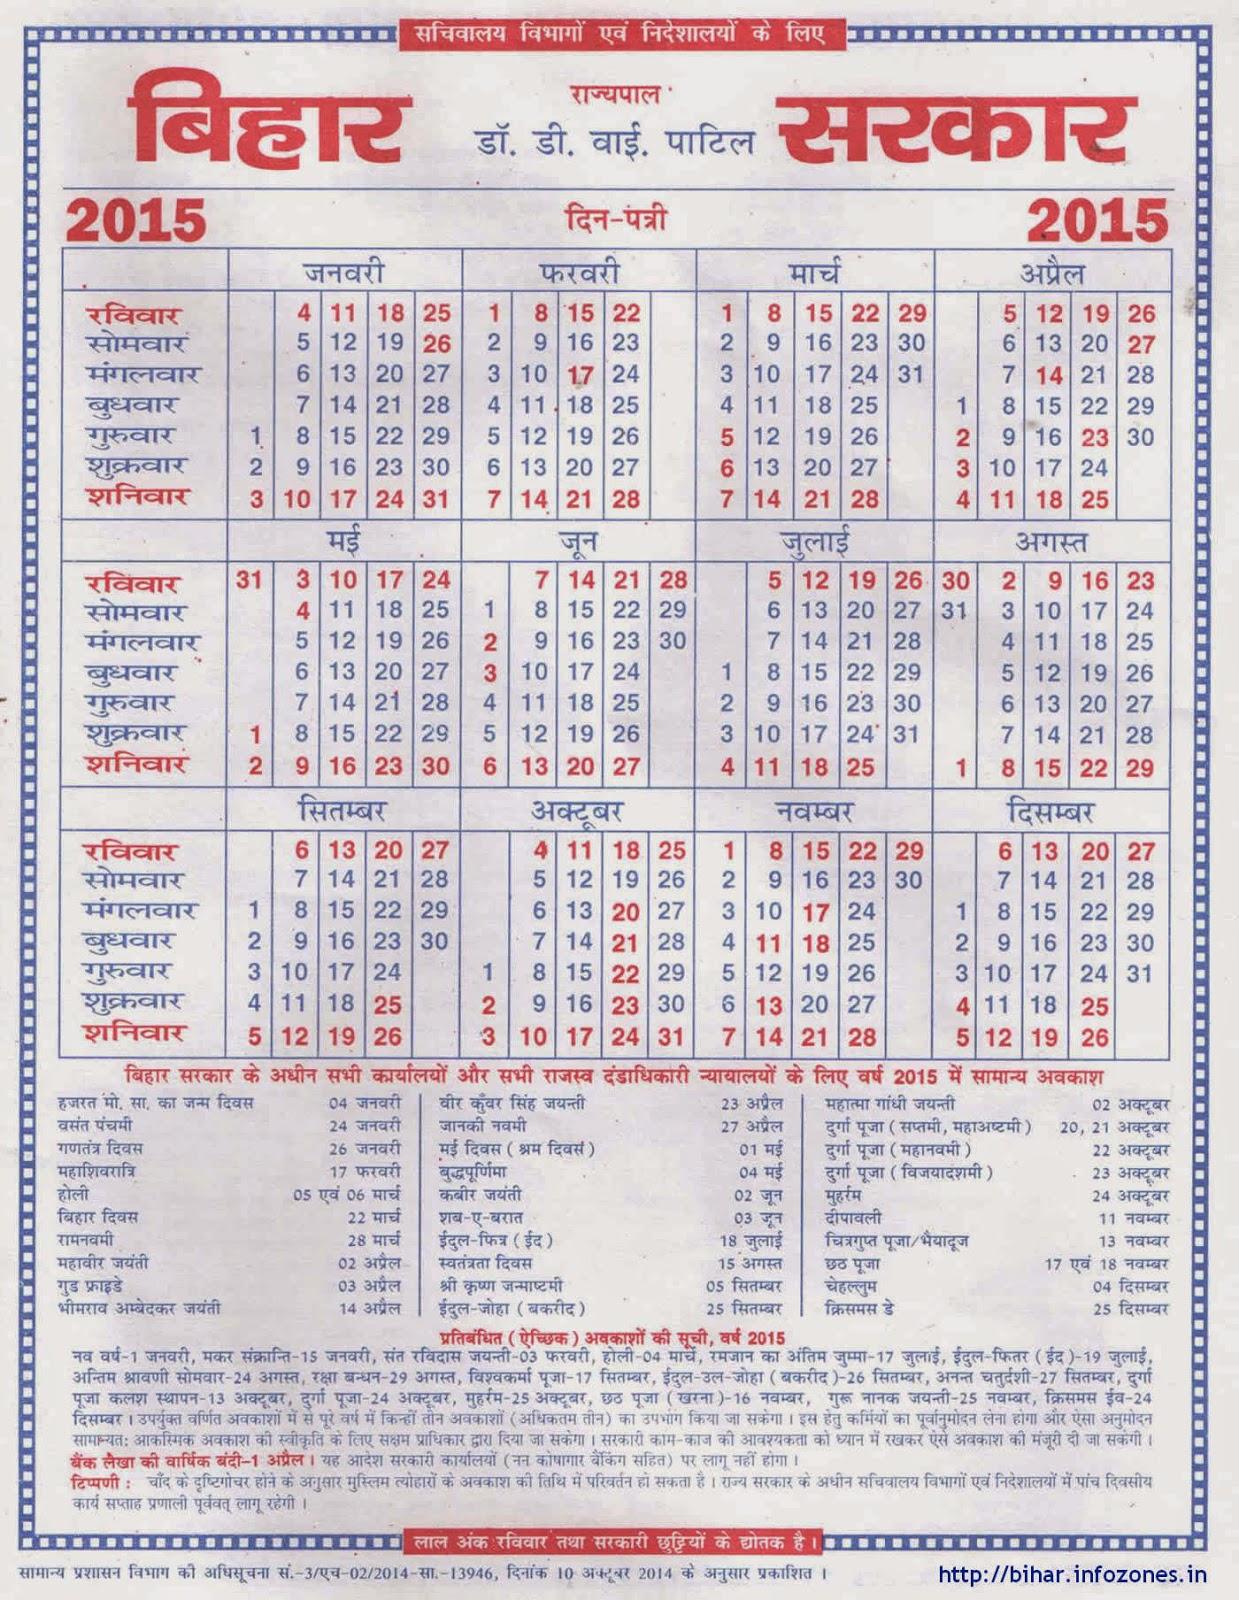 Bihar Government Calendar 2015 with Bihar Govt Calendar 2018